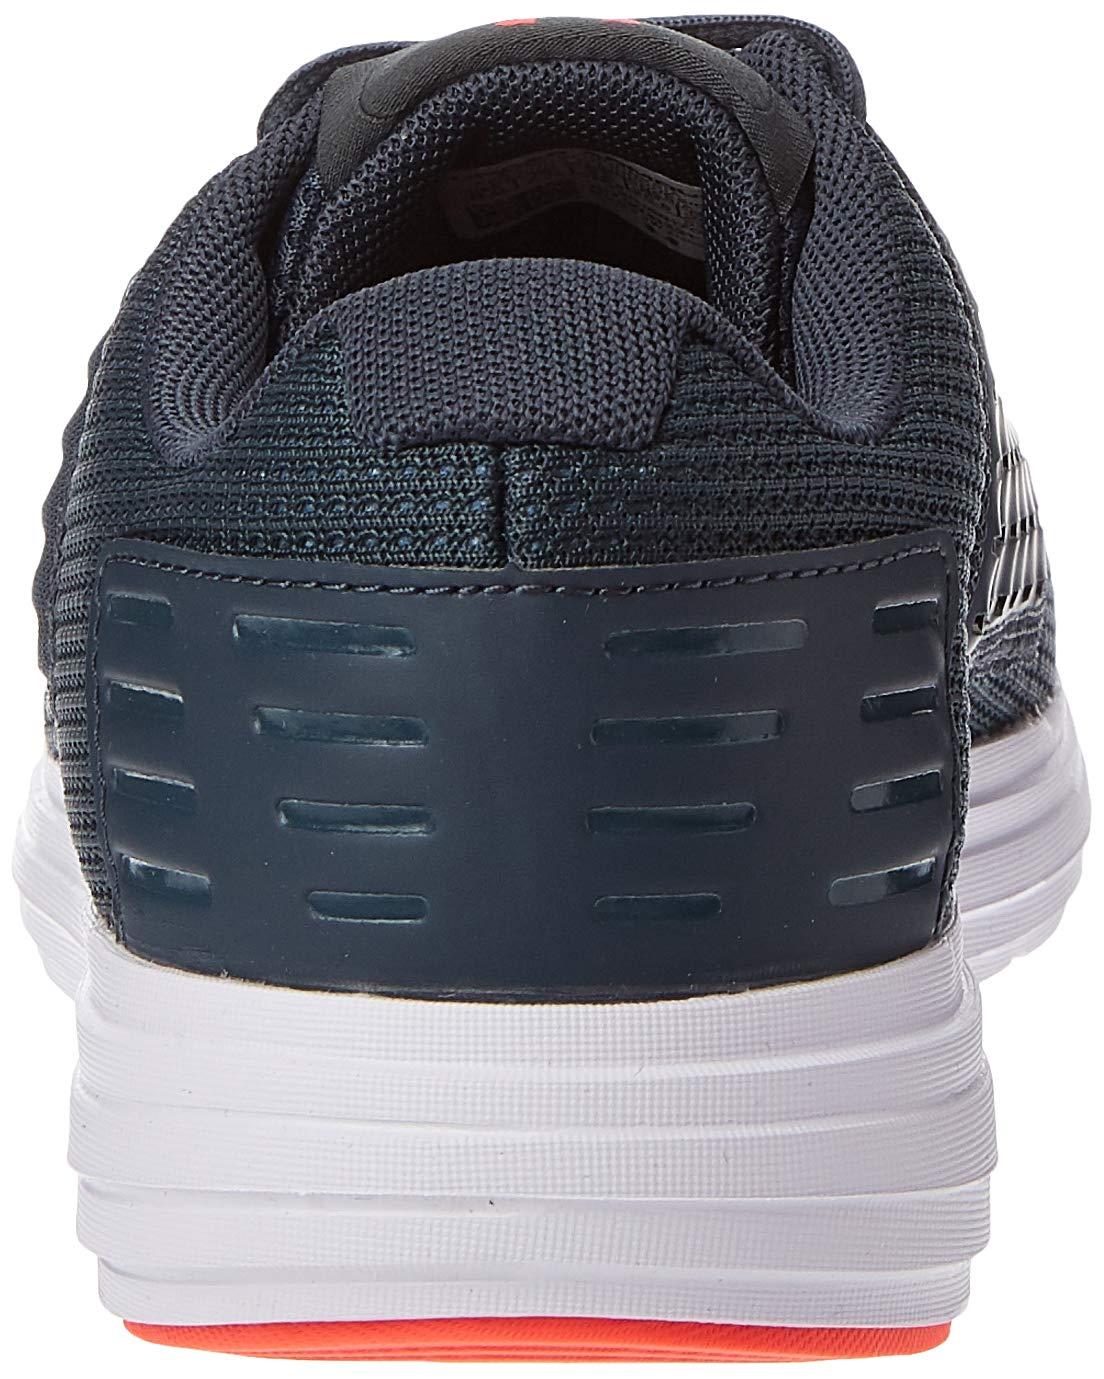 Under Armour 3021231-004 Men/'s Black Surge SE Running Sneakers